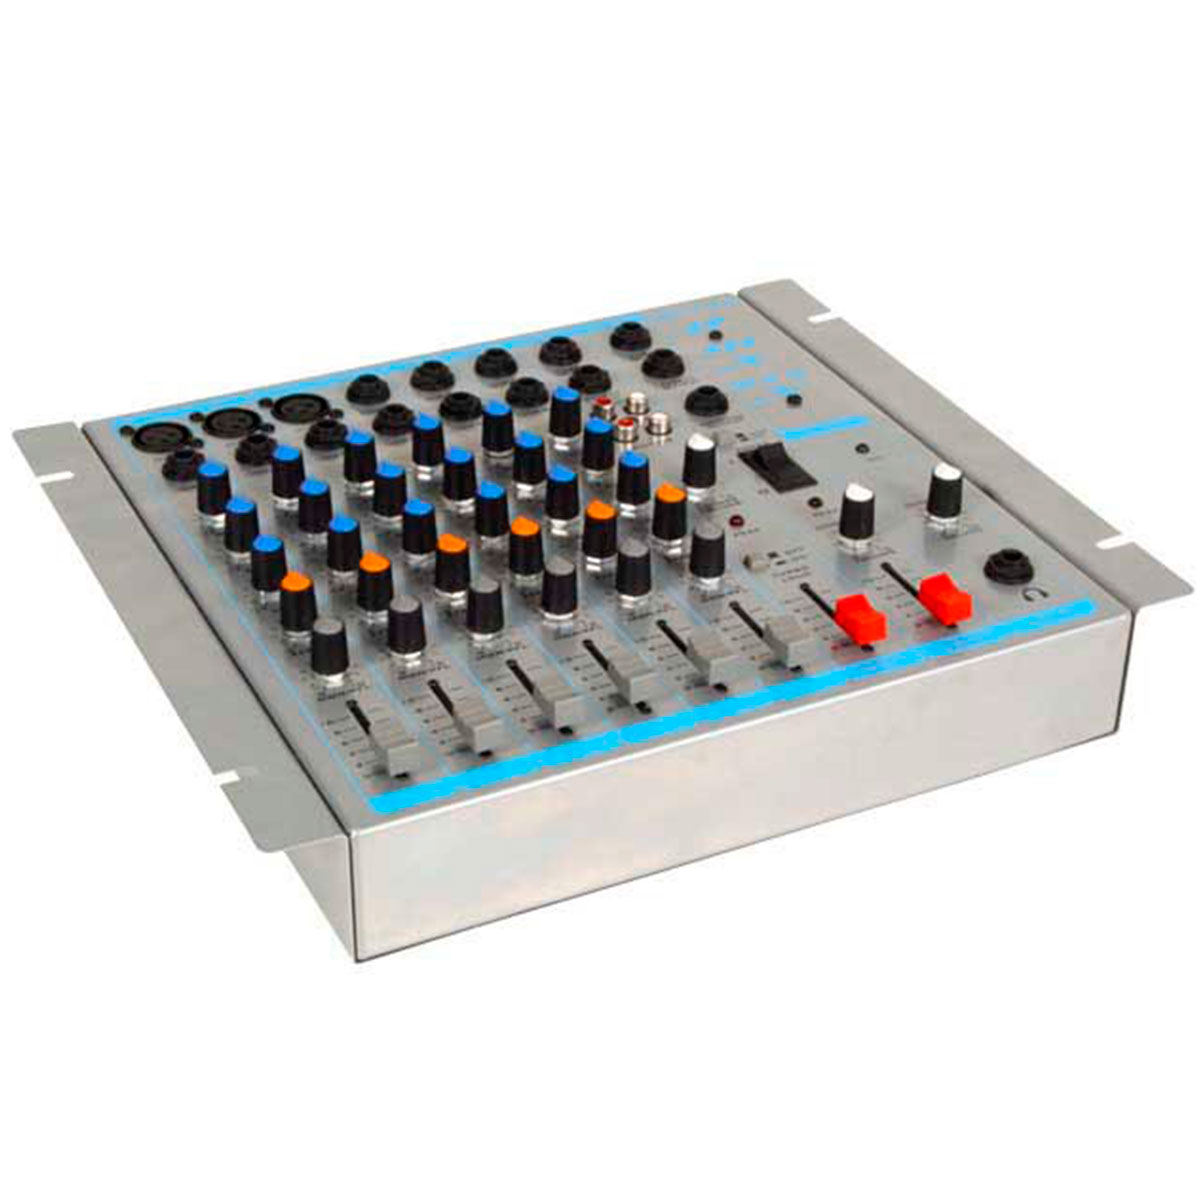 OMX612X - Mesa de Som / Mixer 6 Canais OMX 612 X - Oneal